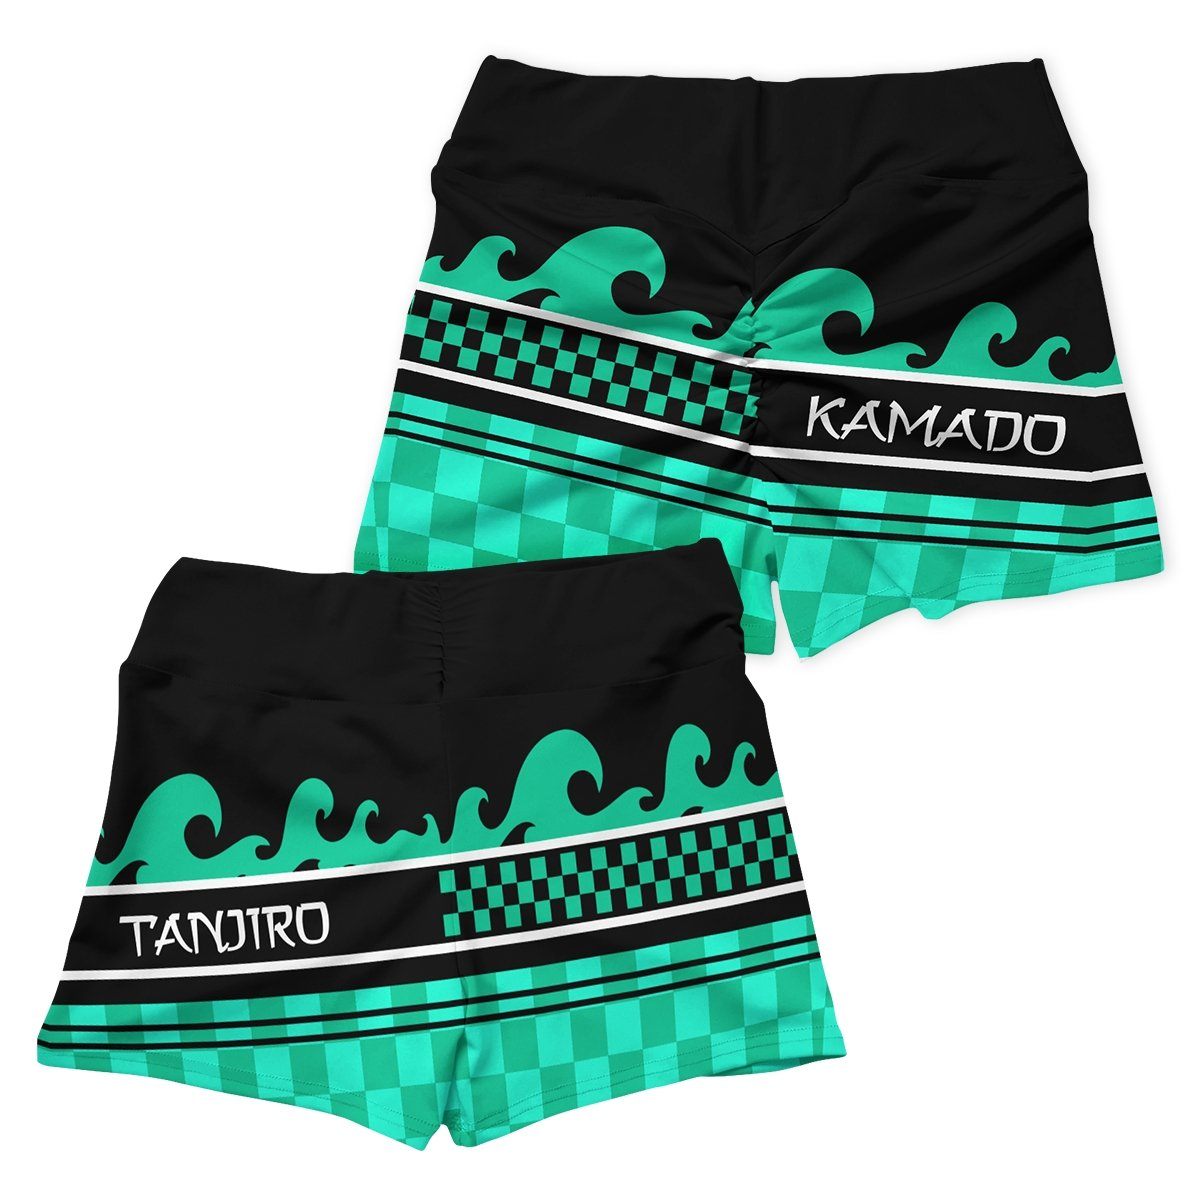 summer tanjiro active wear set 439676 - Anime Swimsuits